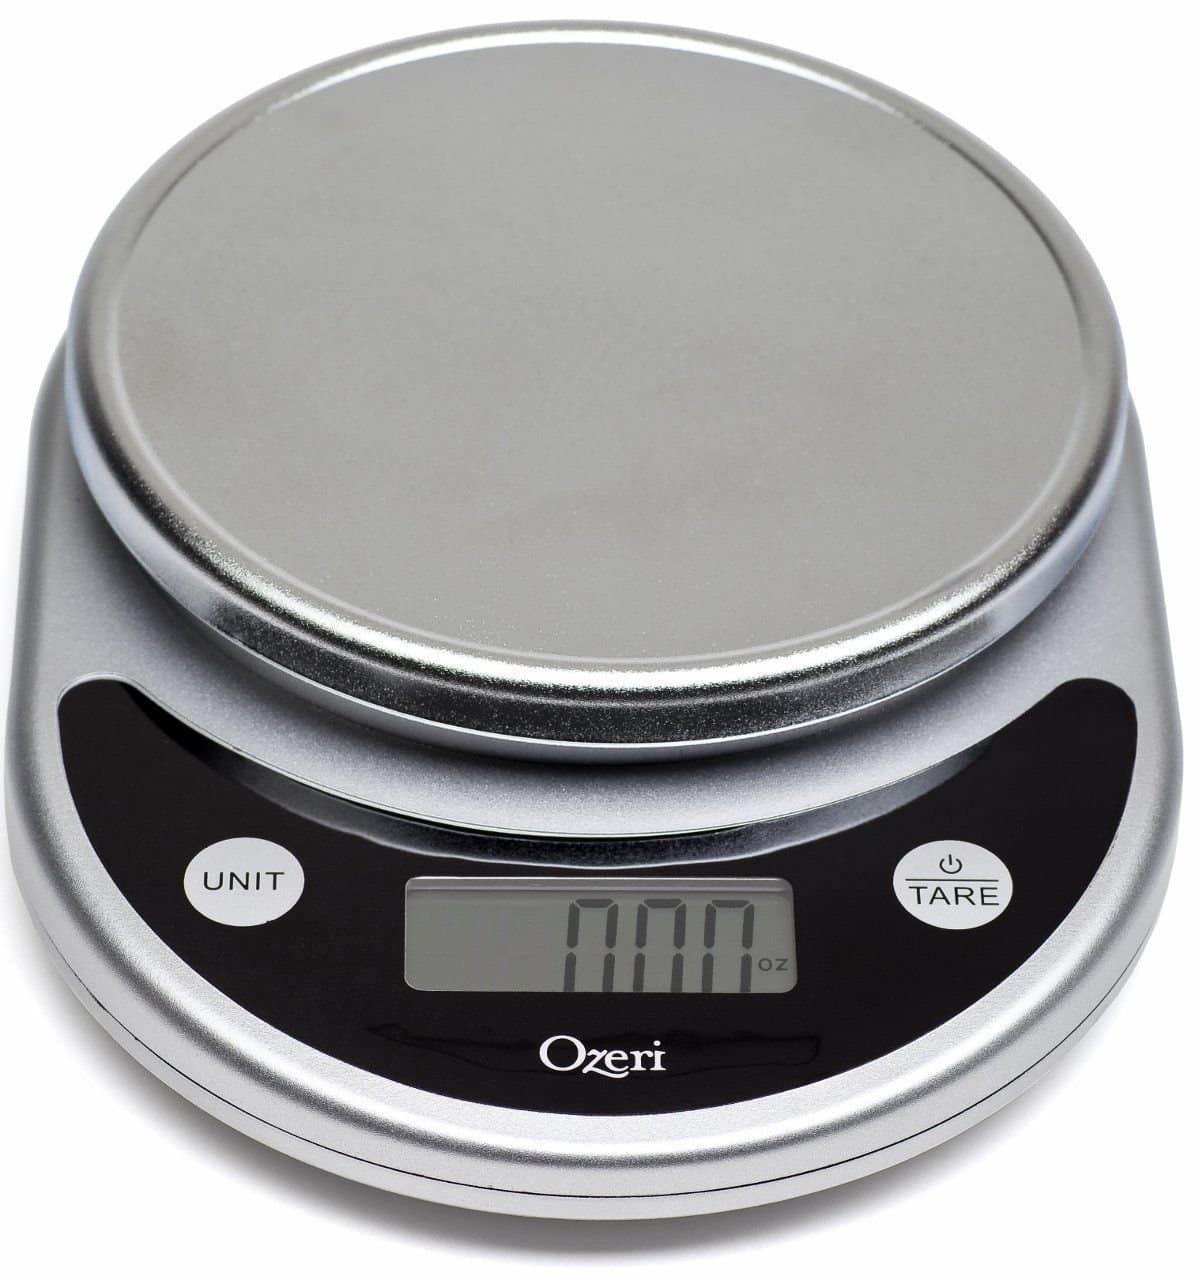 Ozeri ZK14-S Pronto Digital Scale